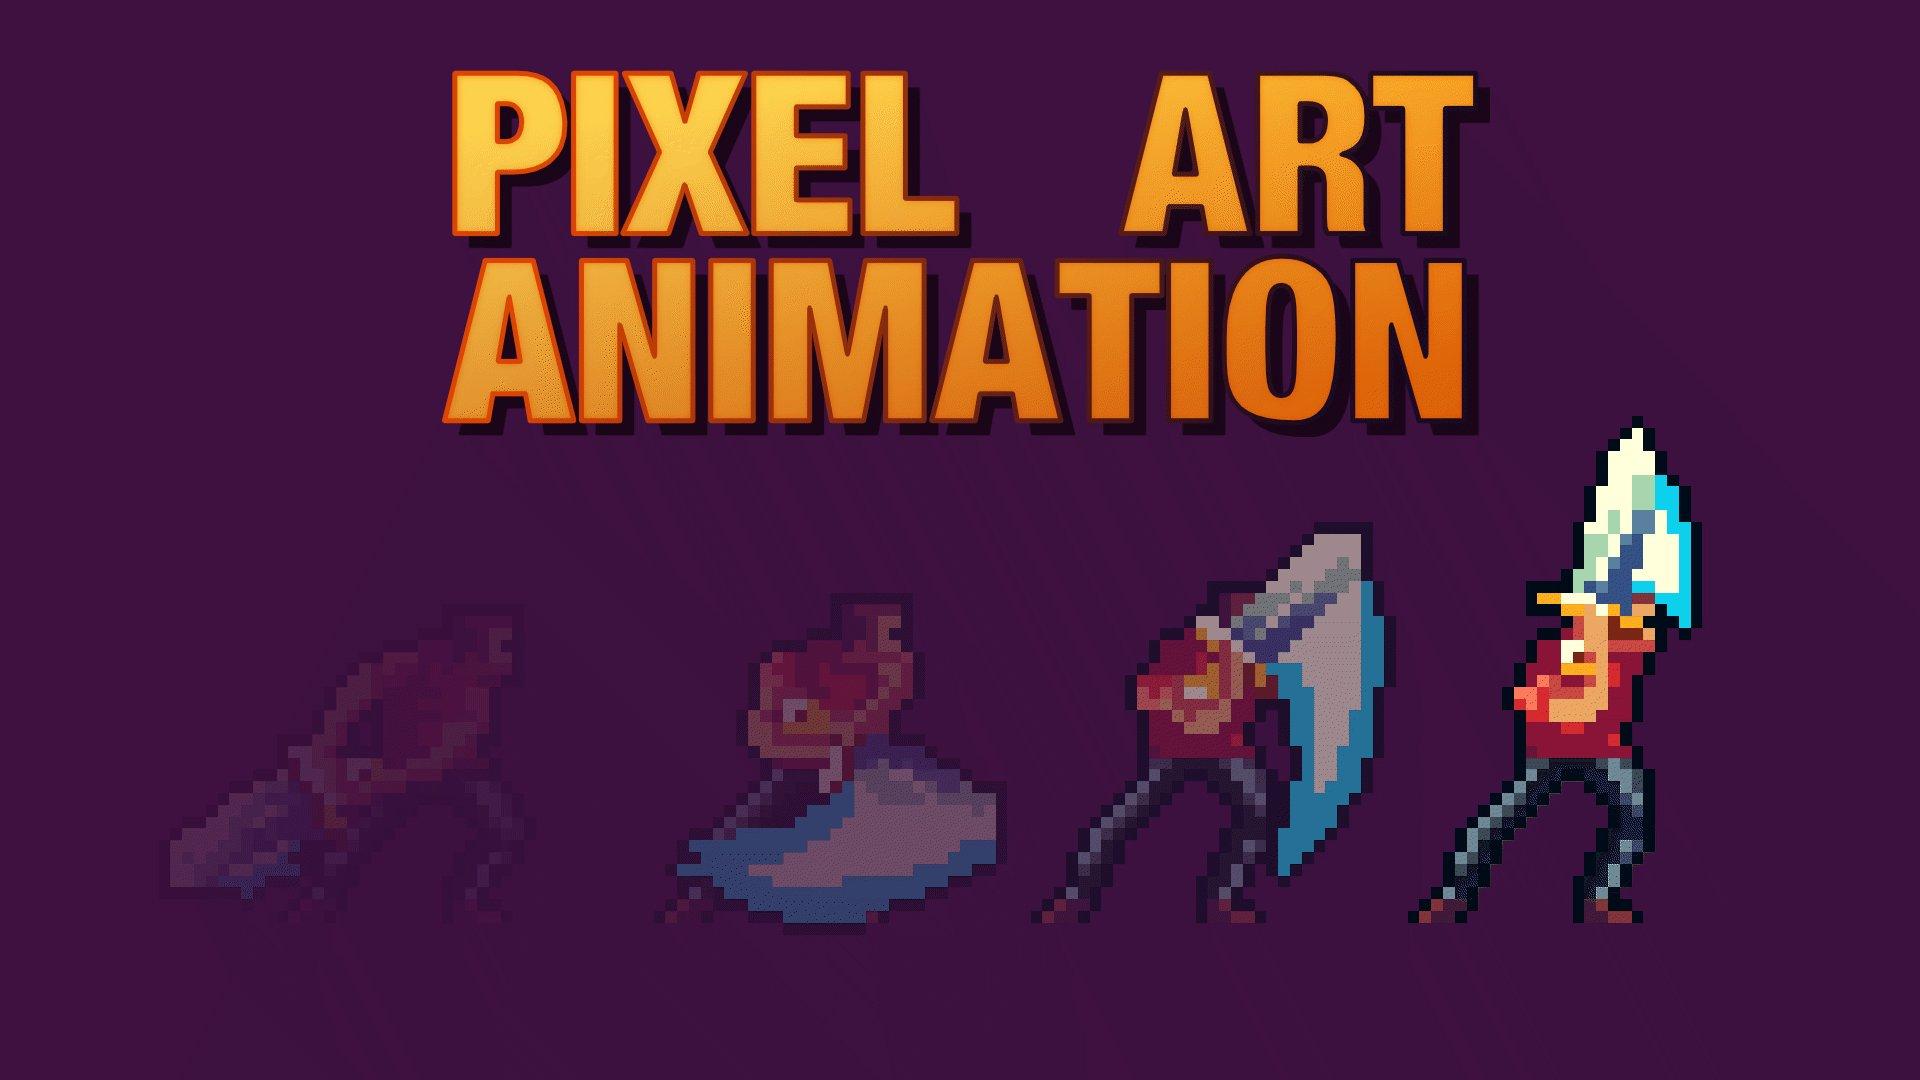 Pixel Art Animation